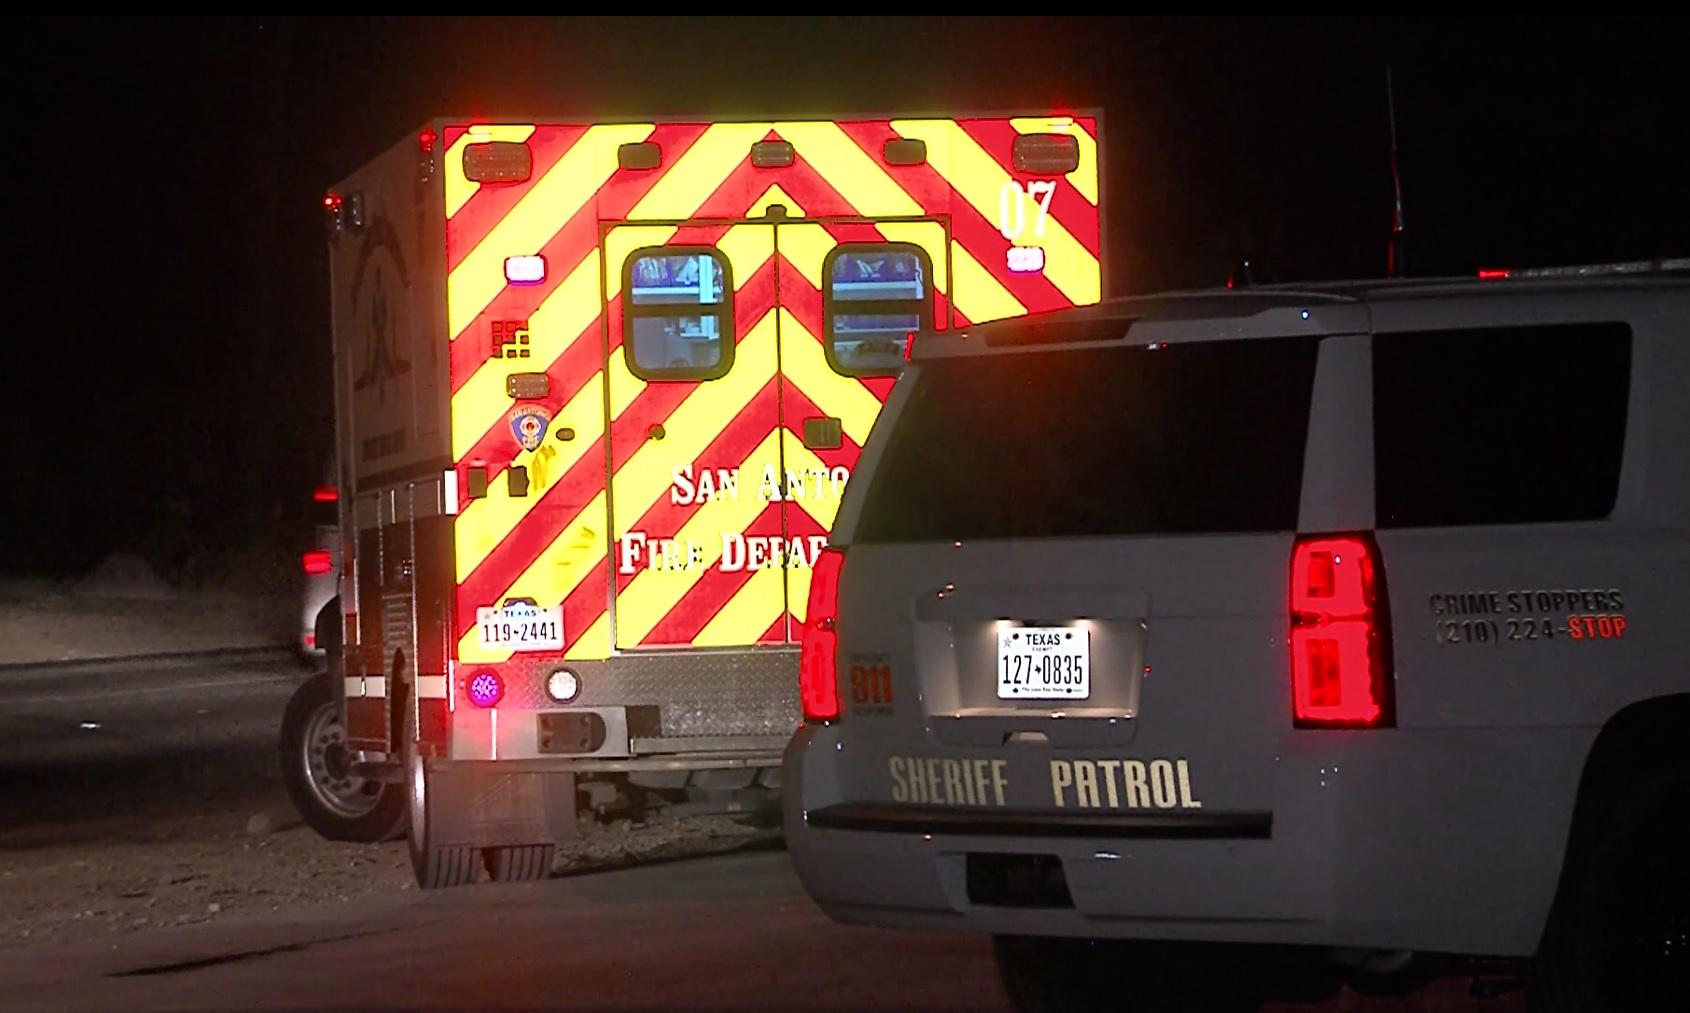 Teen killed in North Bexar County crash identified - San Antonio